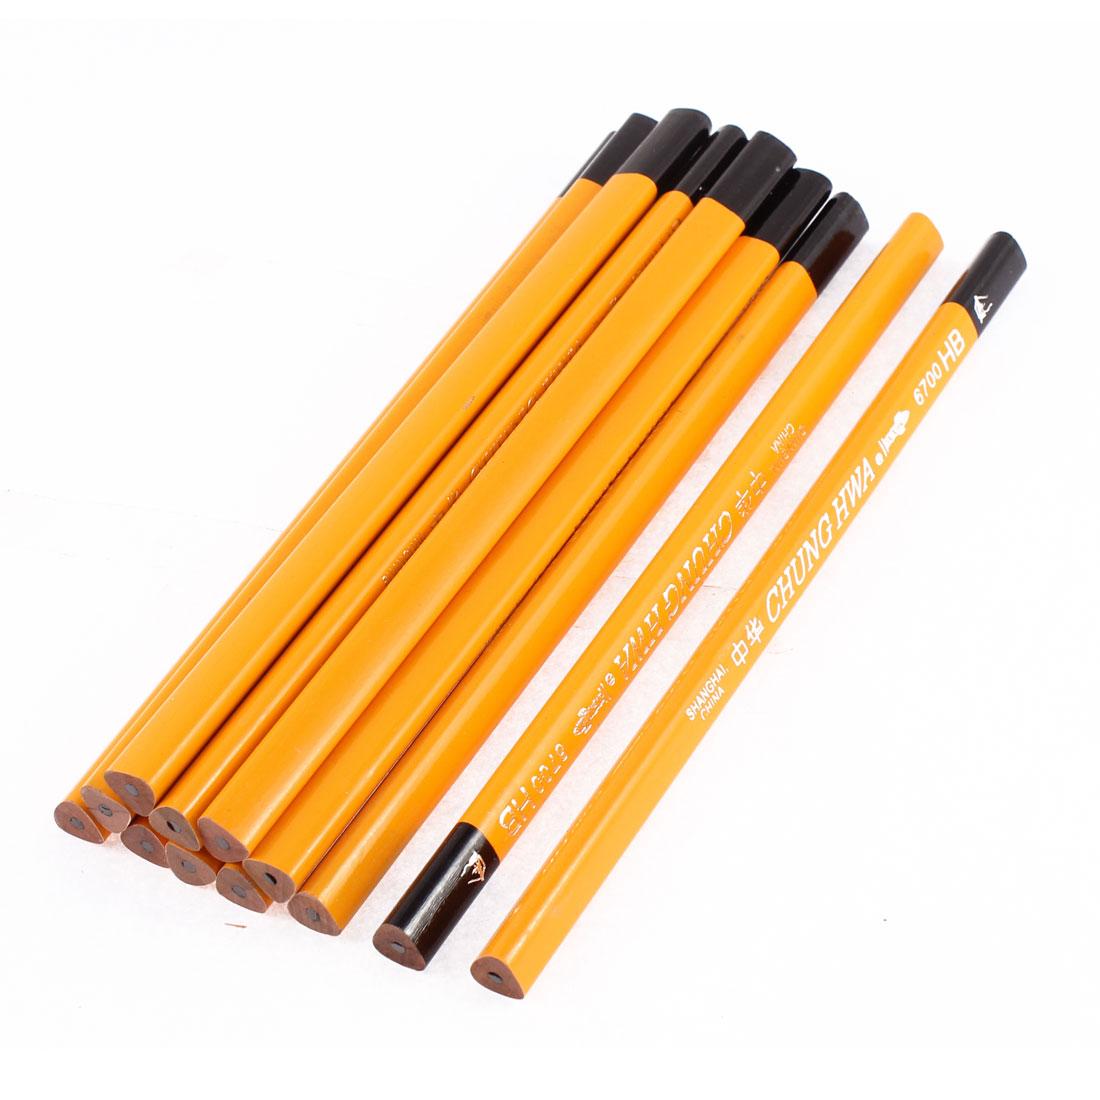 School Wooden Triangular Shaped Drawing Writing Lead Pencils 12 Pcs Yellow